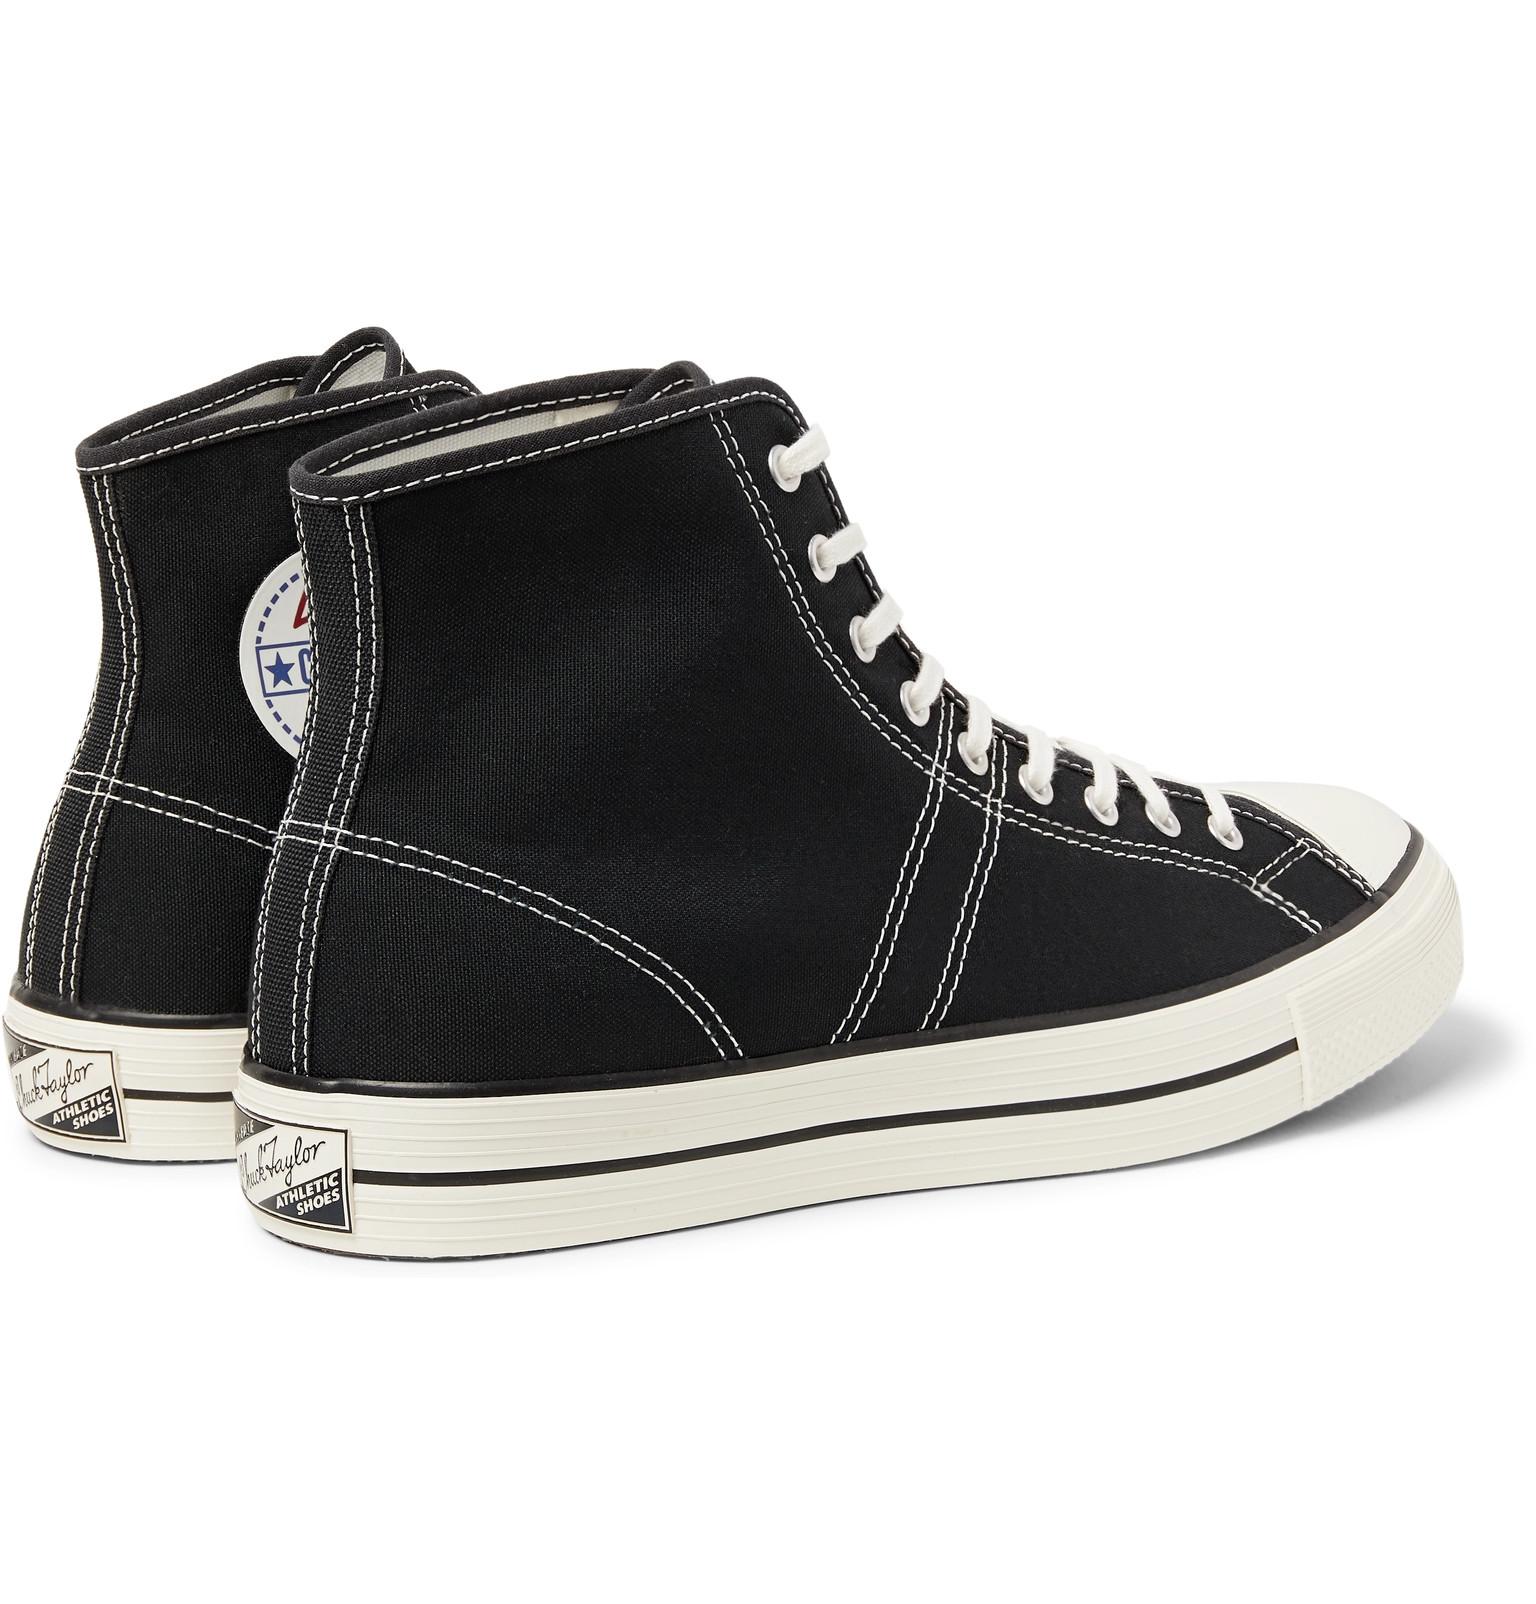 8201b658a9b Converse - Lucky Star Canvas High-Top Sneakers